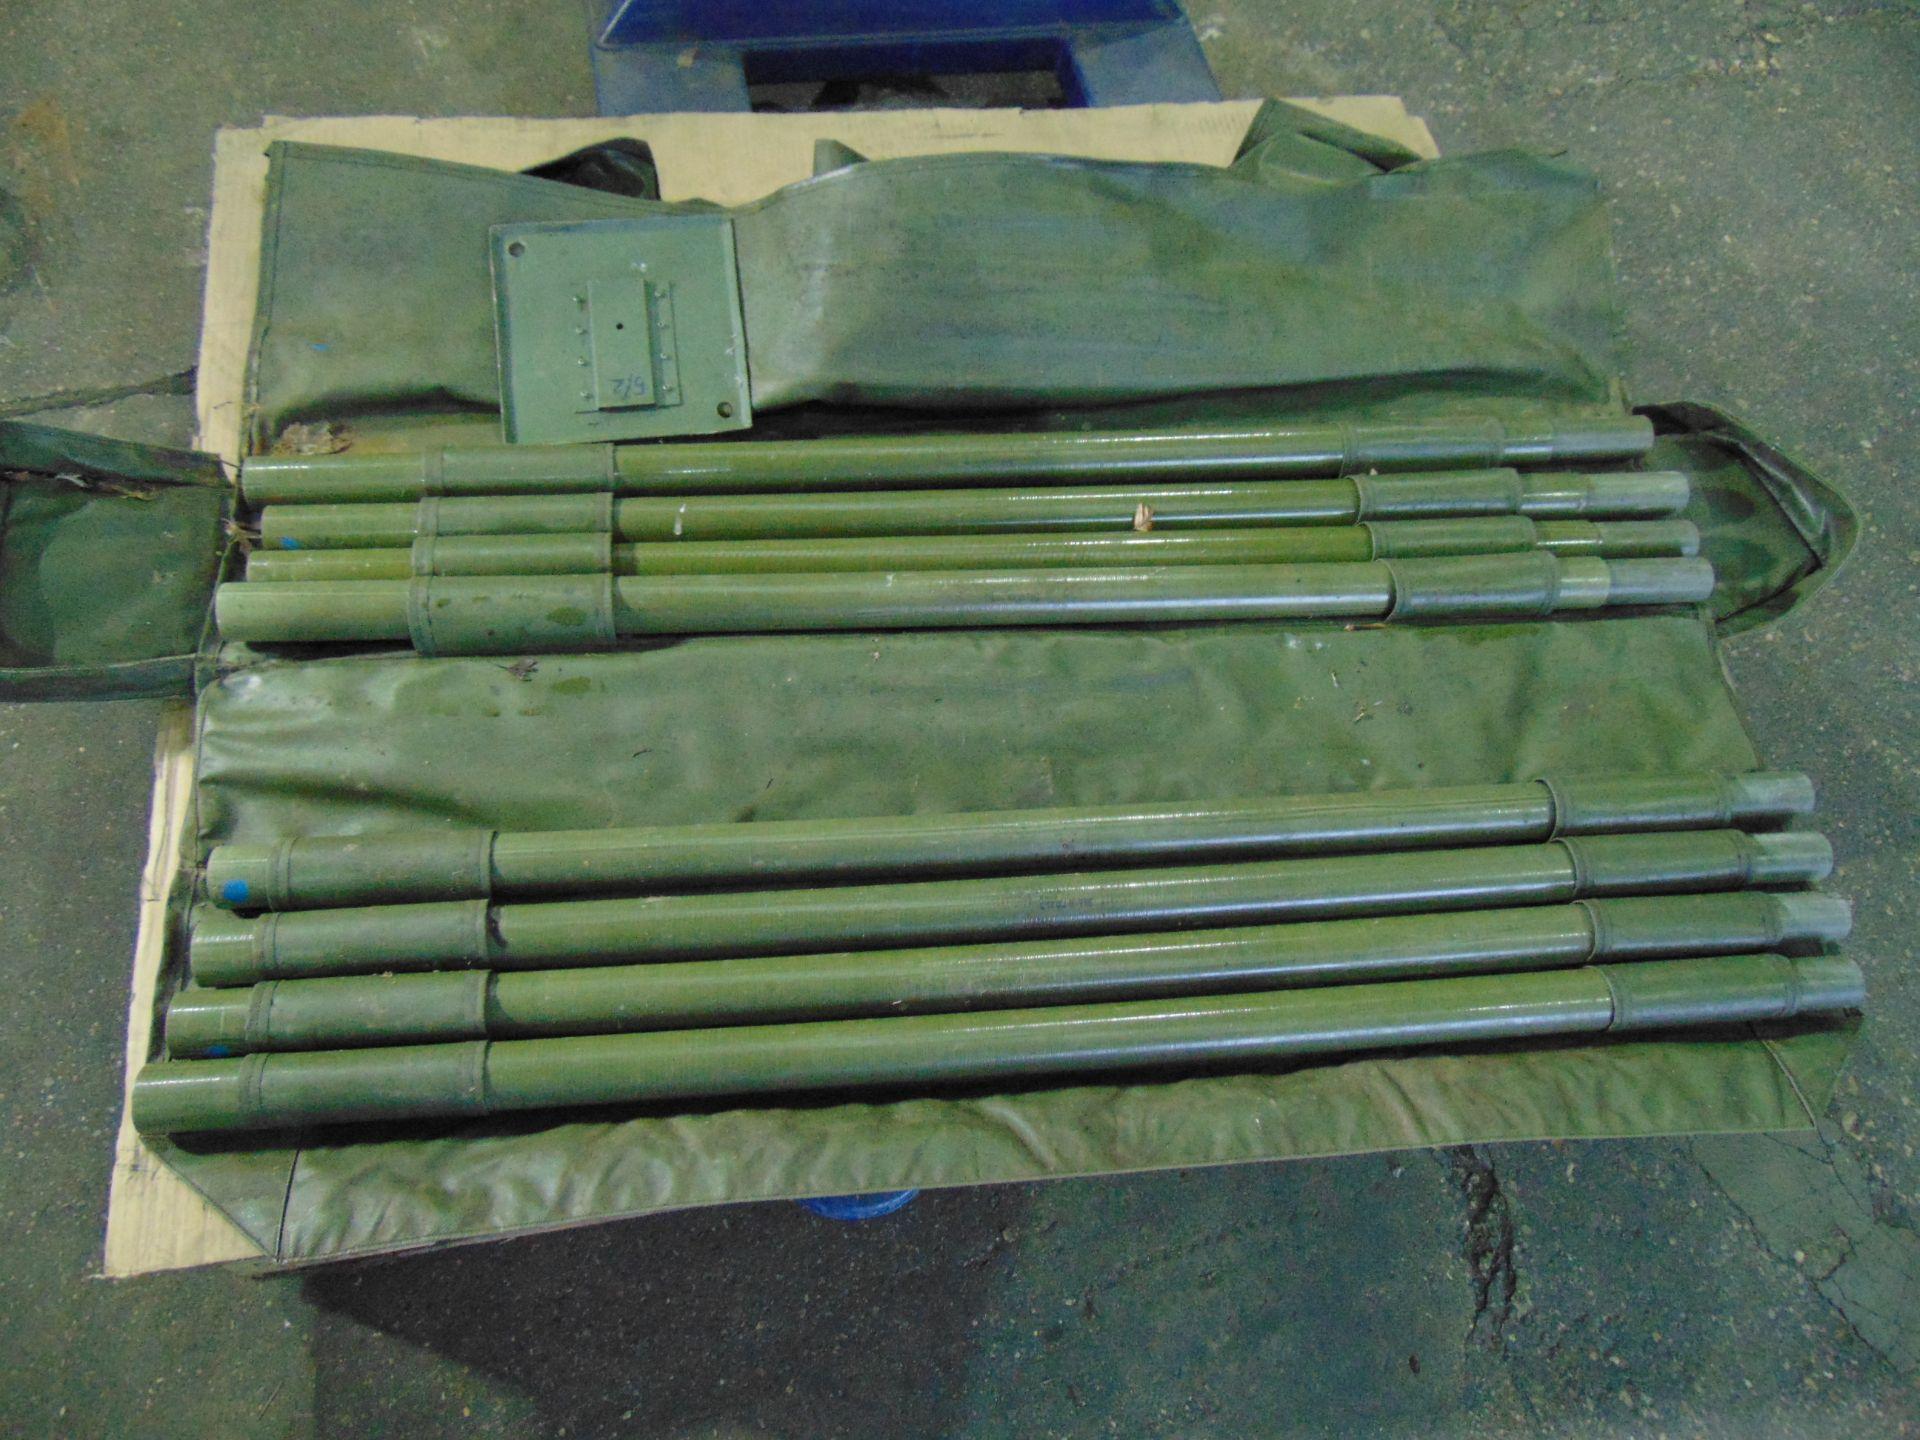 Lotto 26428 - Racal 9 Metre Portable Mast Kit